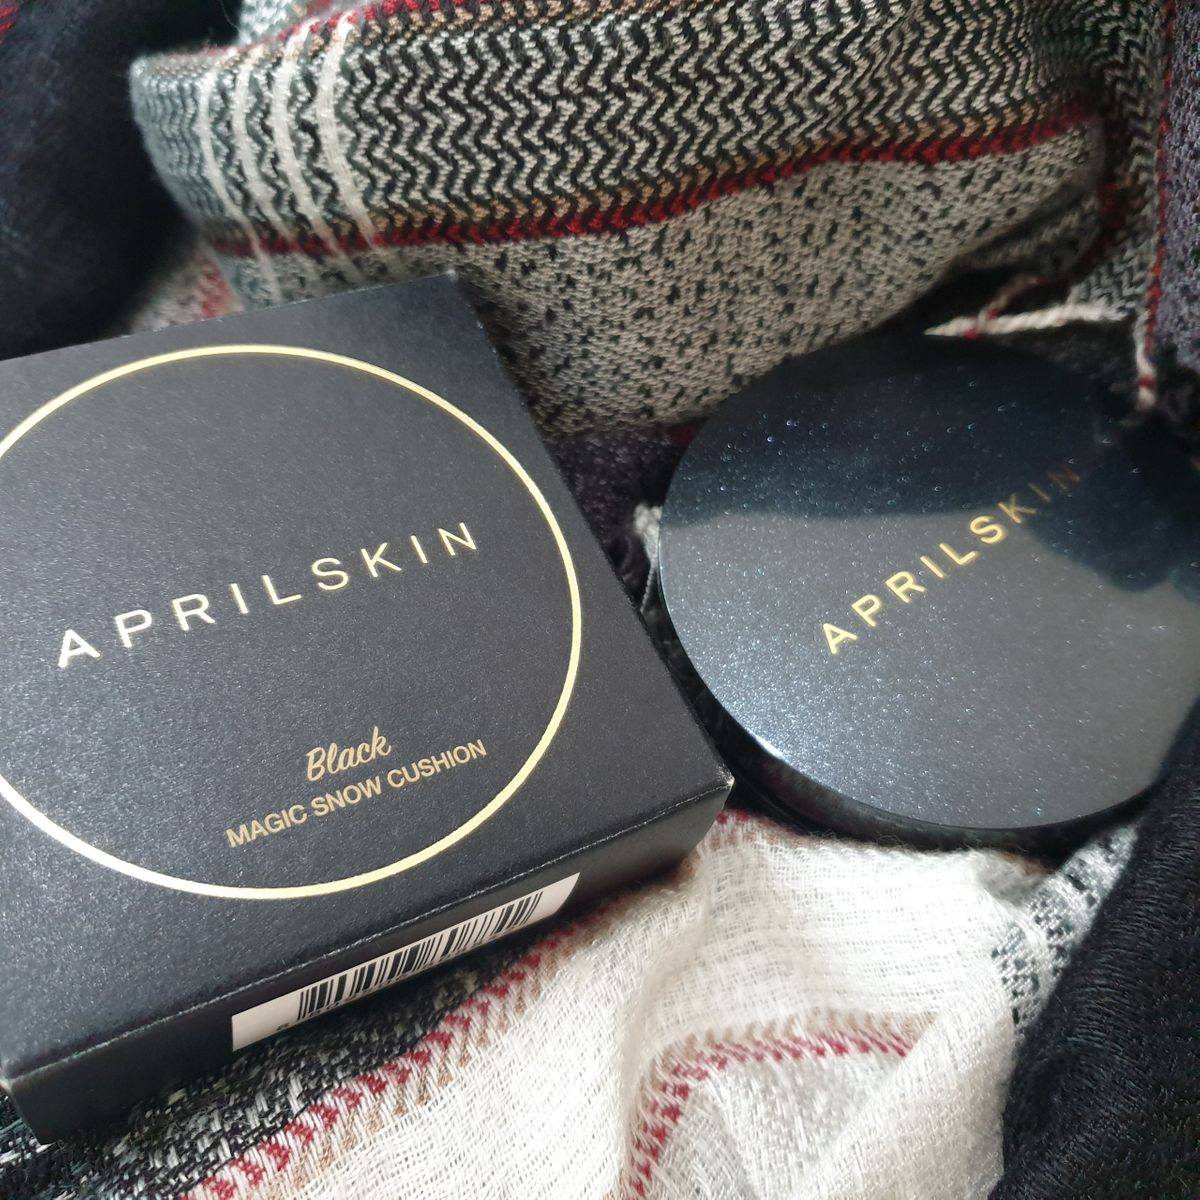 Phấn Nước April Skin Black Magic Snow Cushion #21 Light Beige (Galaxy Edition)